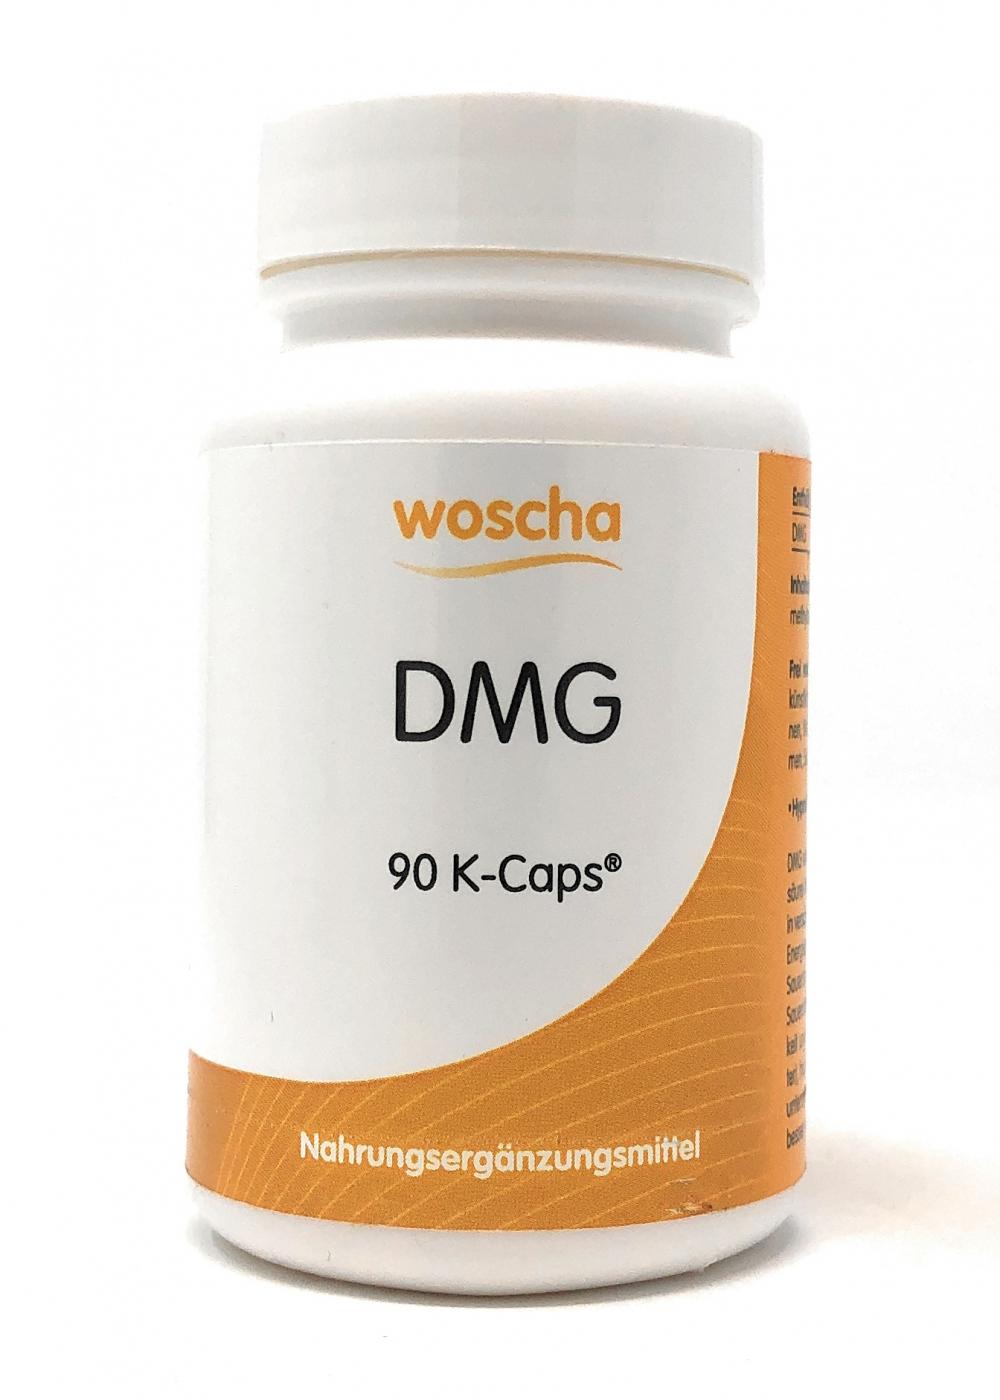 woscha DMG 90 K-Caps (19g)(vegan)